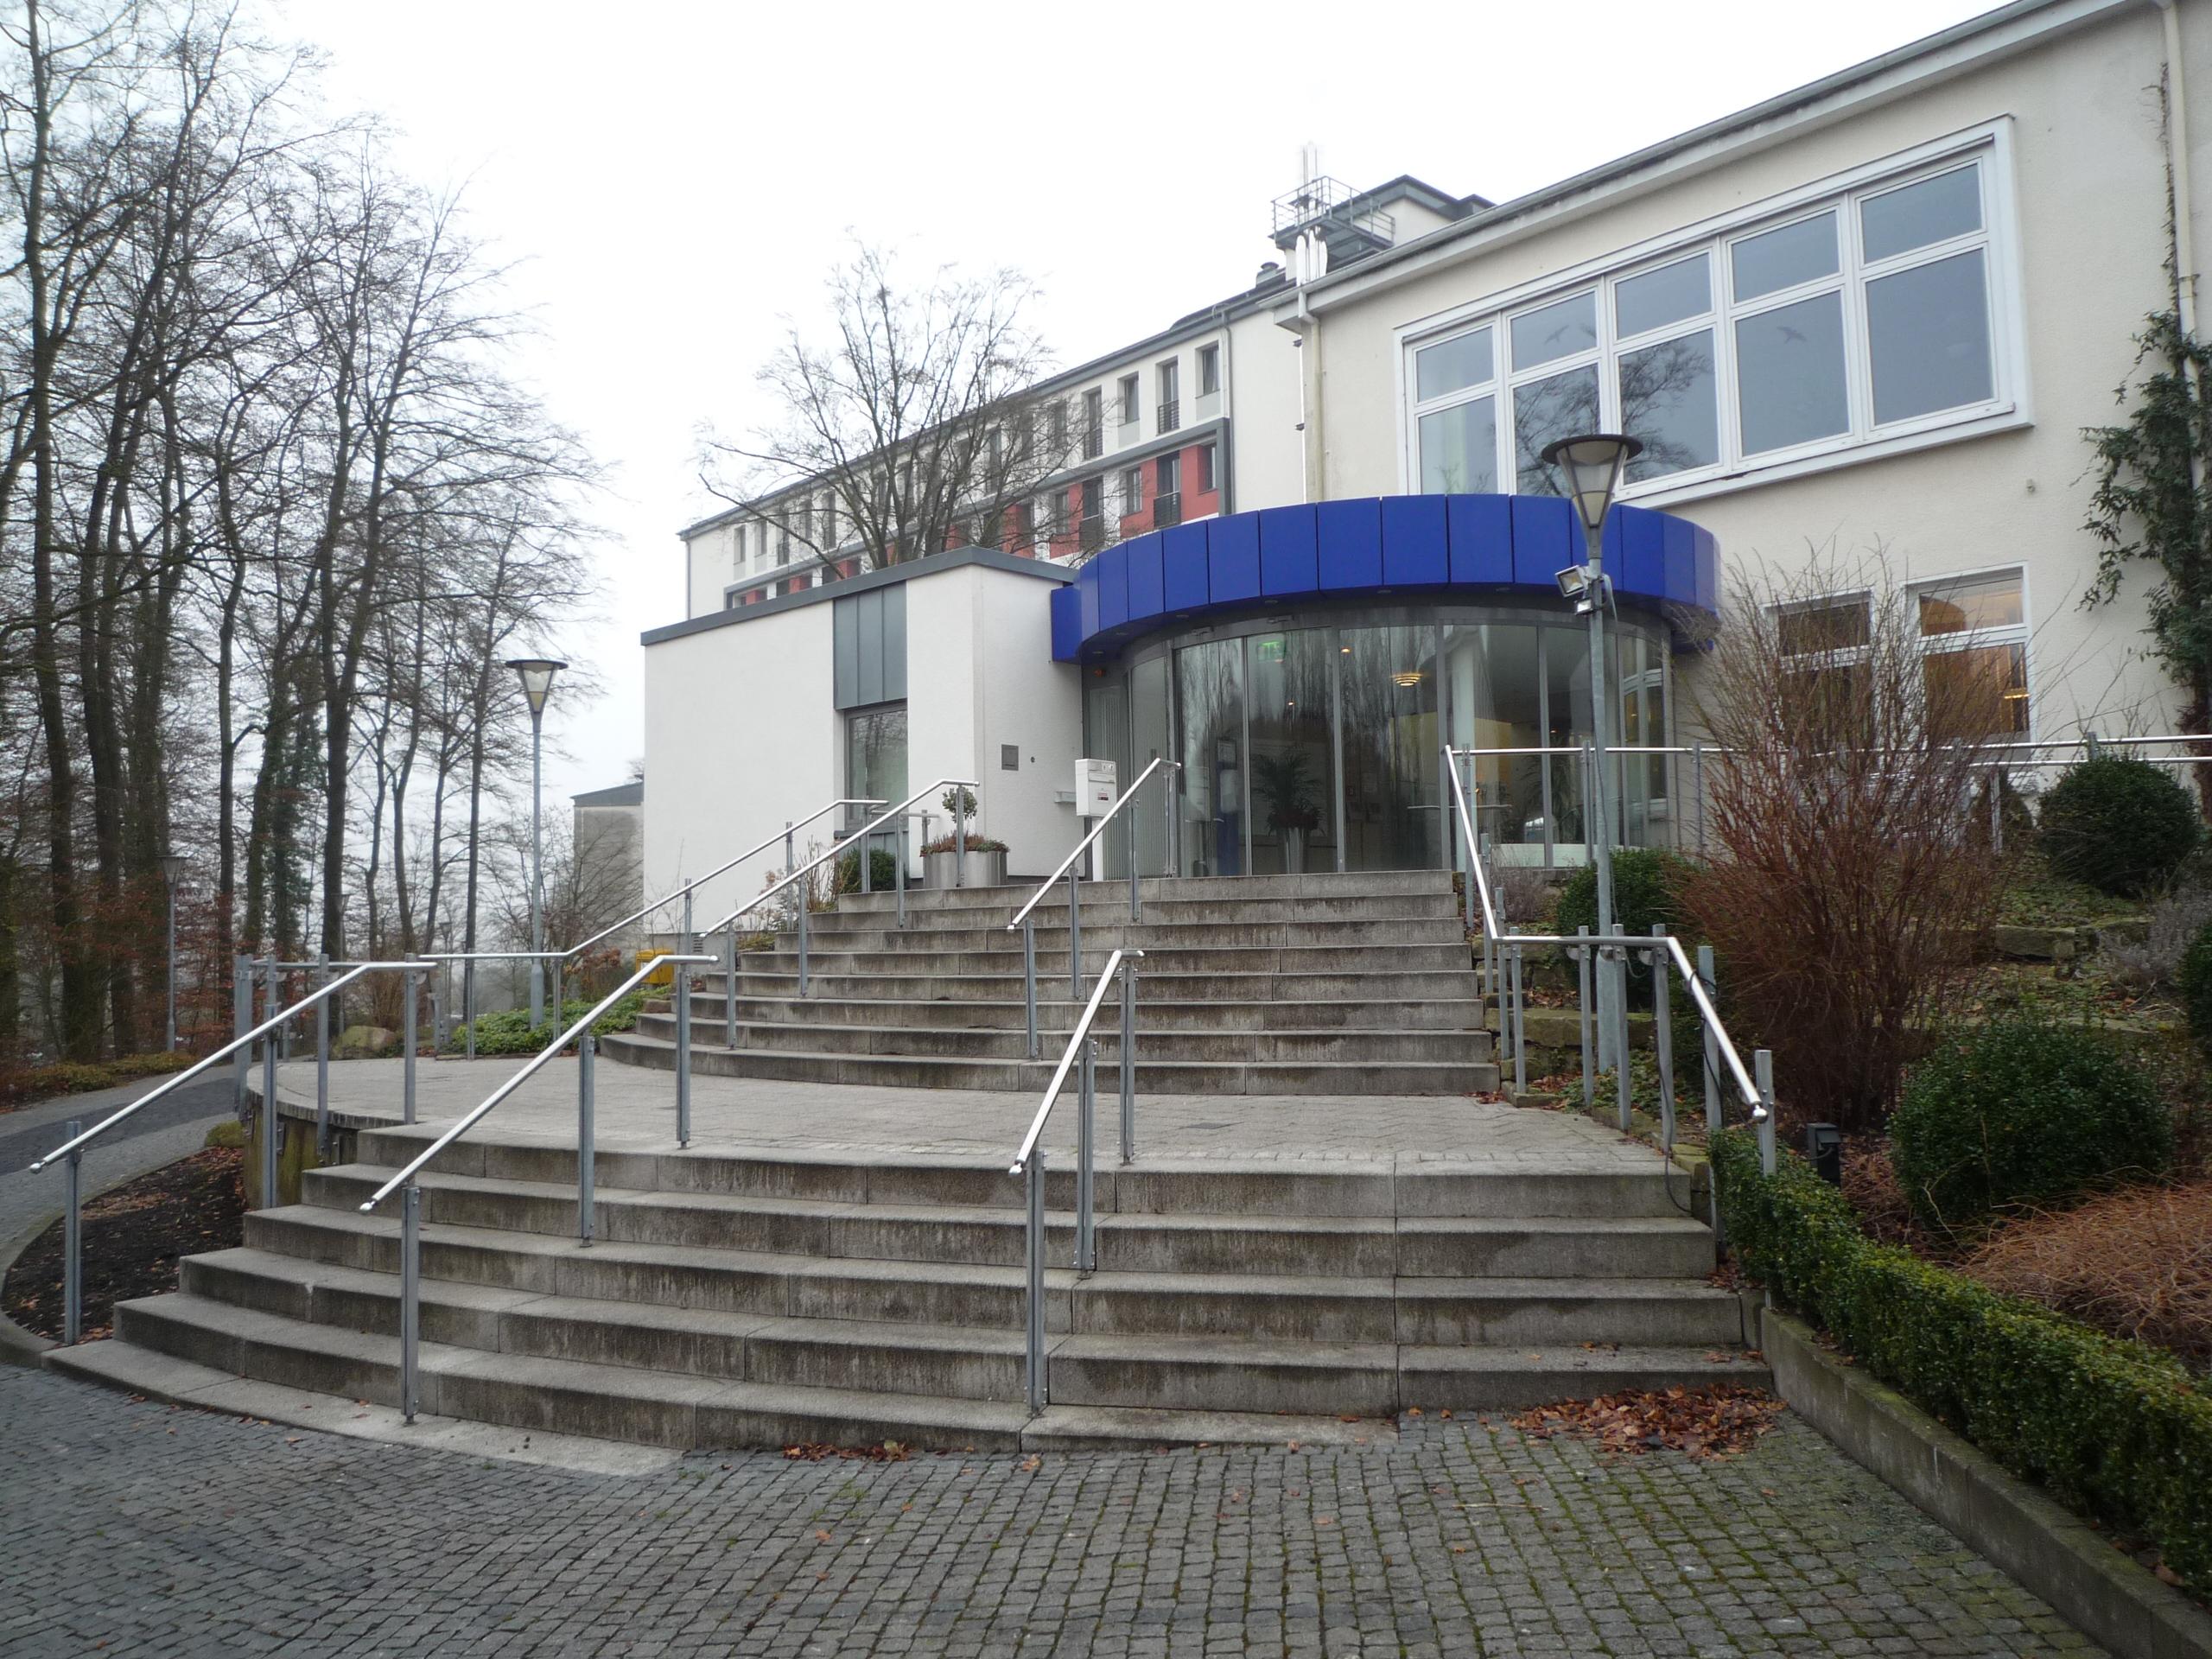 Teutoburger wald klinik bad rothenfelde | Kliniken